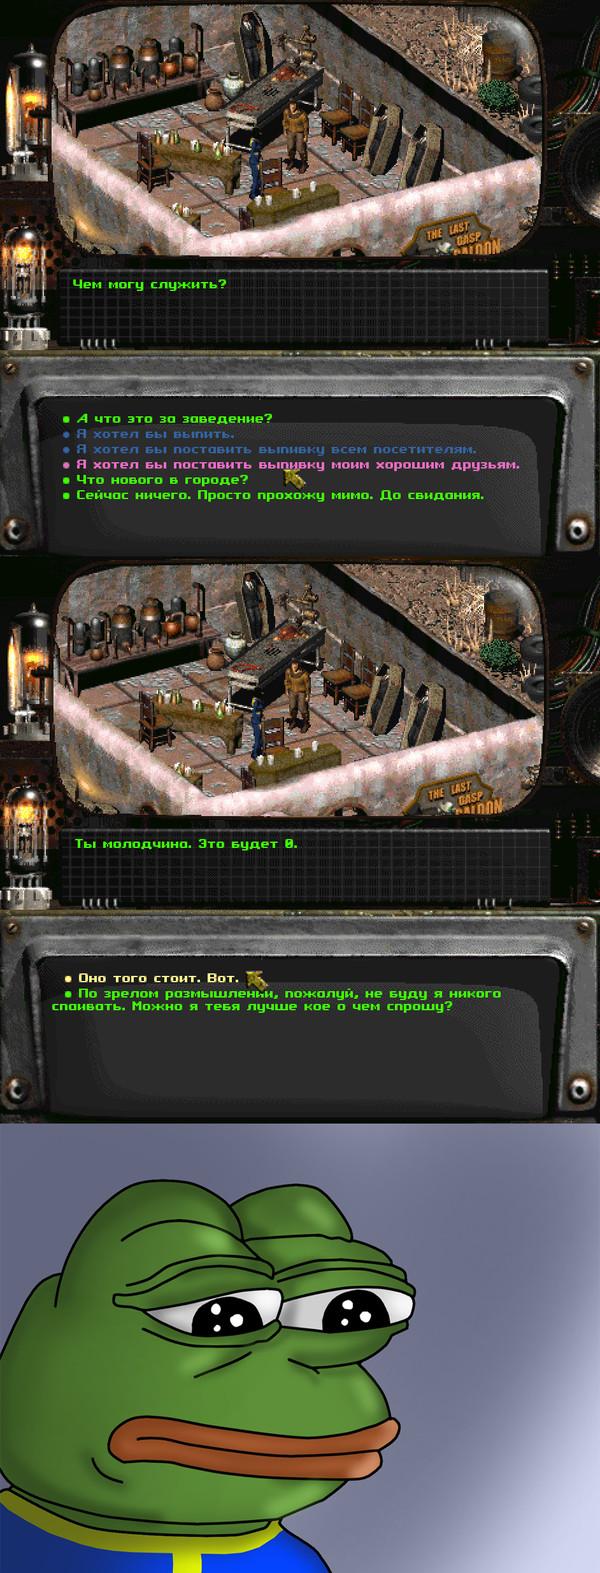 Fallout намекает fallout, Pepe, Fallout 2, длиннопост